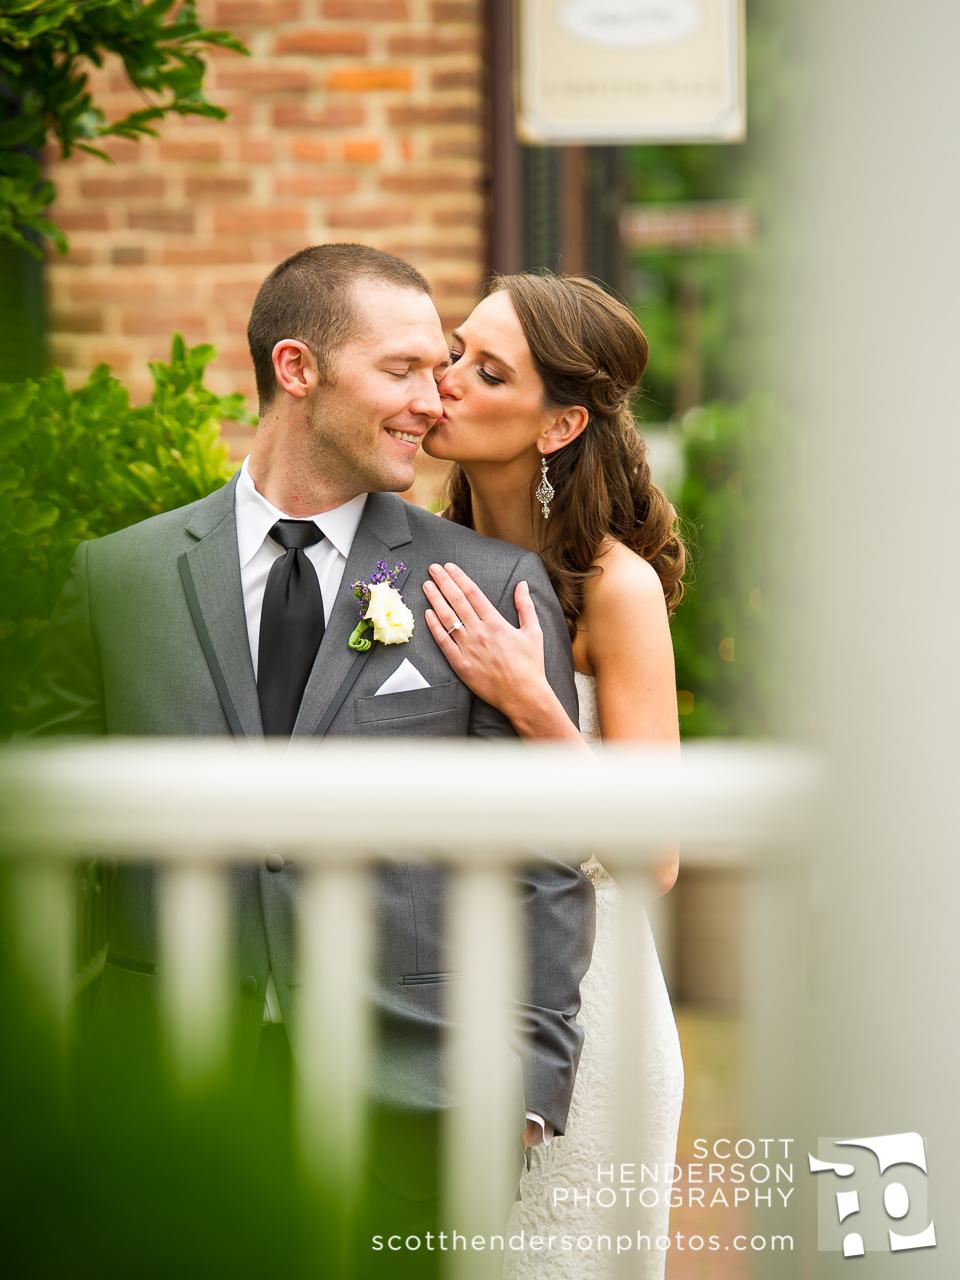 yearinreview-wedding-015.jpg